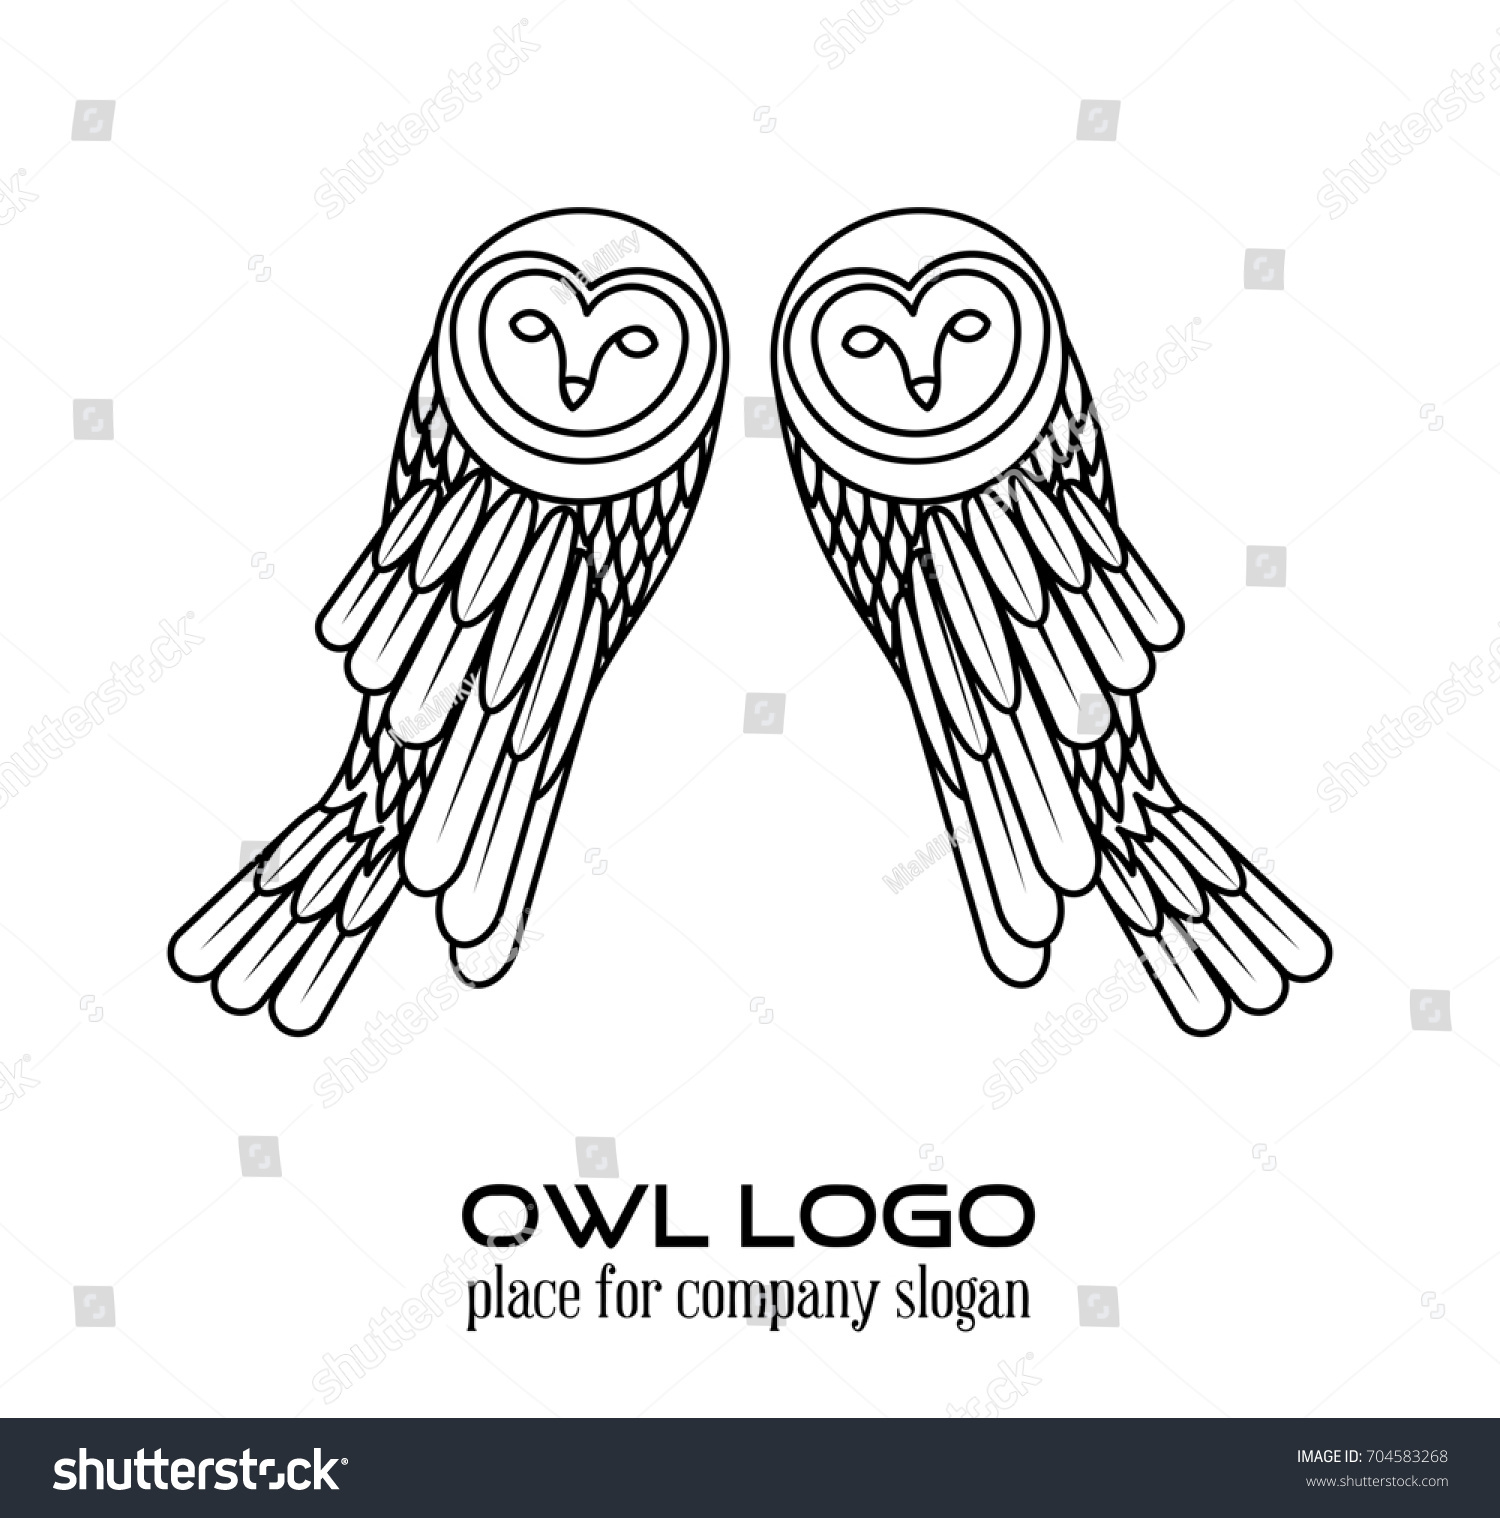 owl logo lineart template line art thin stock illustration 704583268